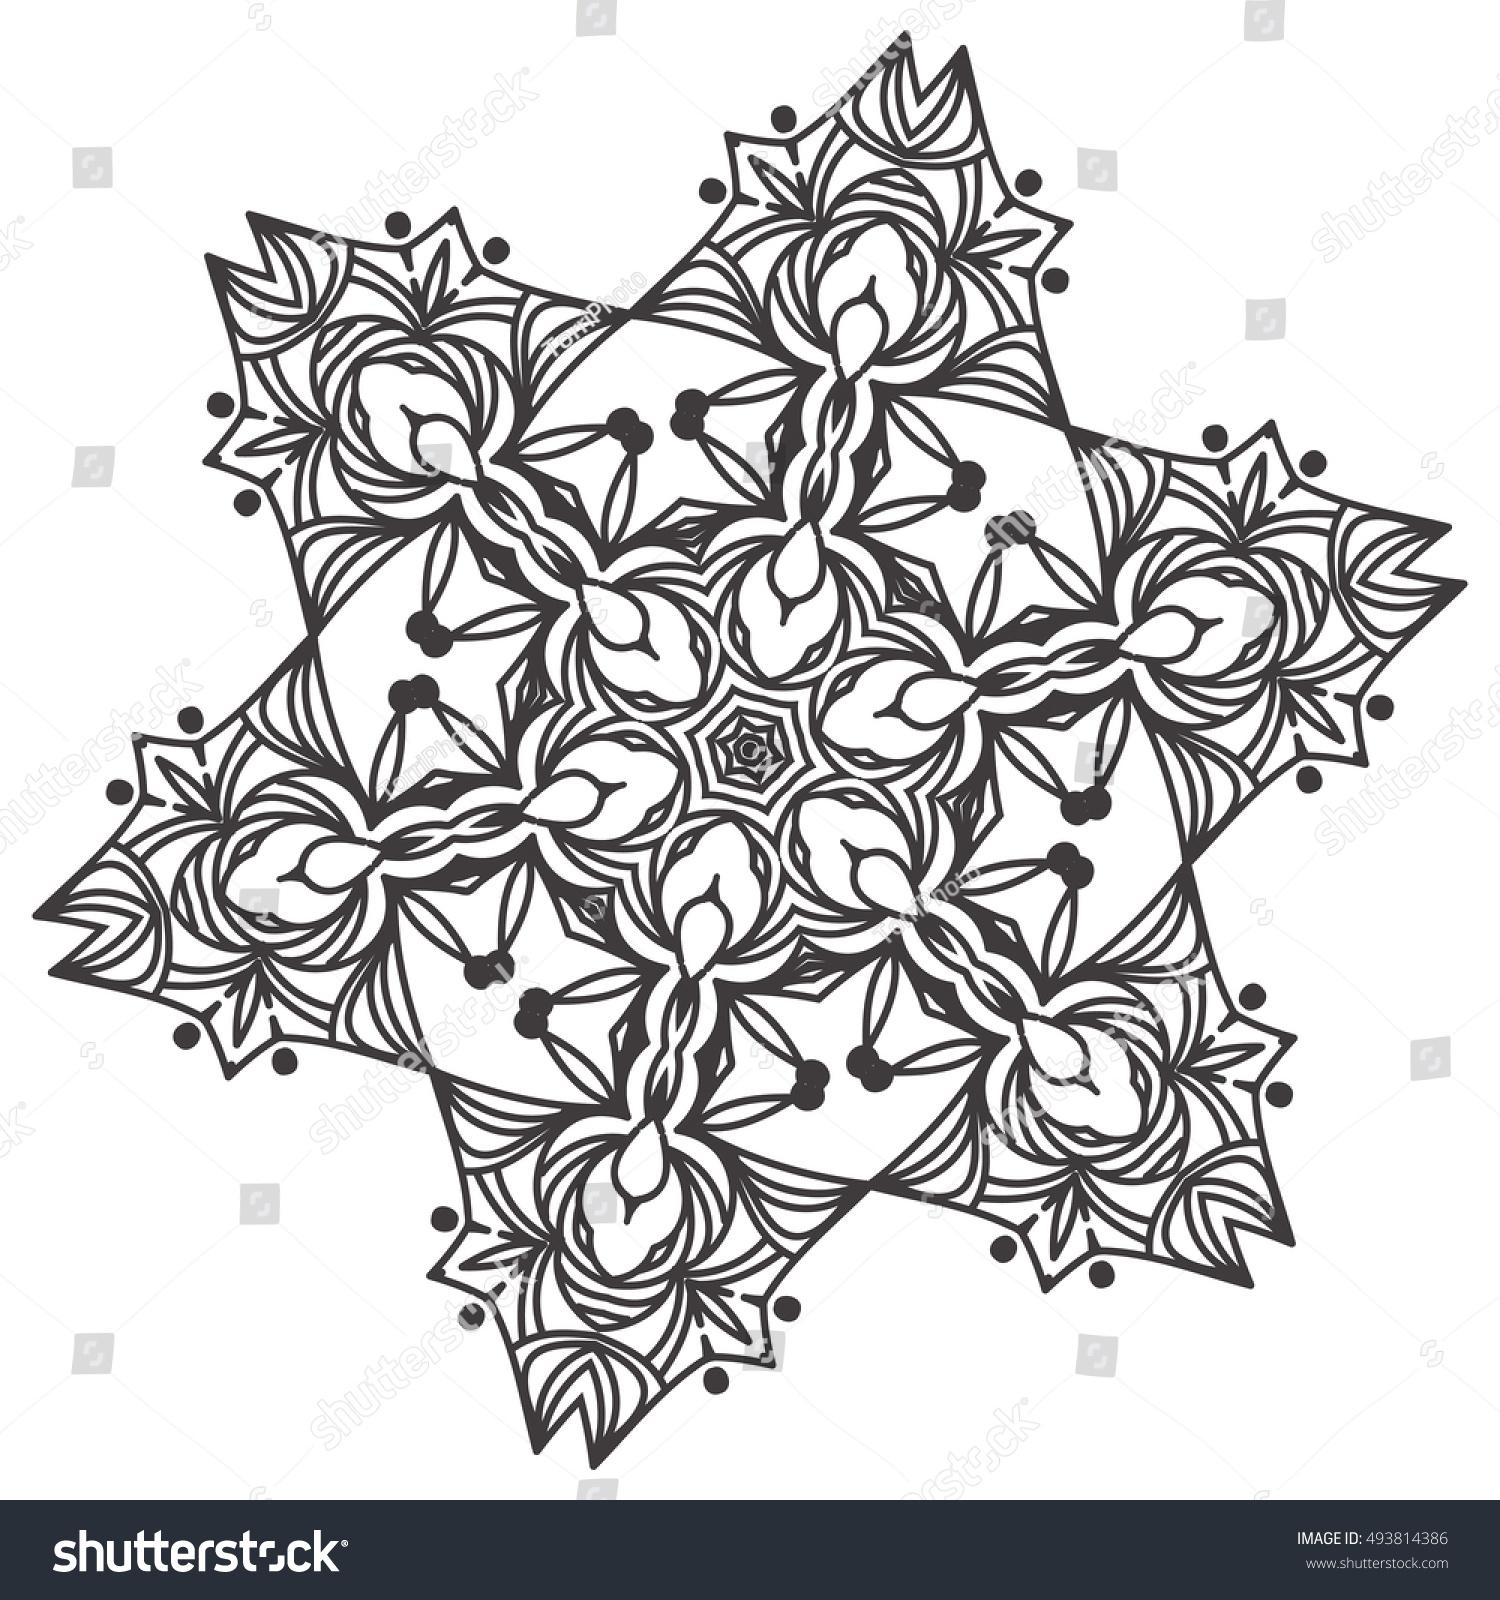 Ethnic Fractal Mandala Floral Doodle Pattern Stock Vector HD ...